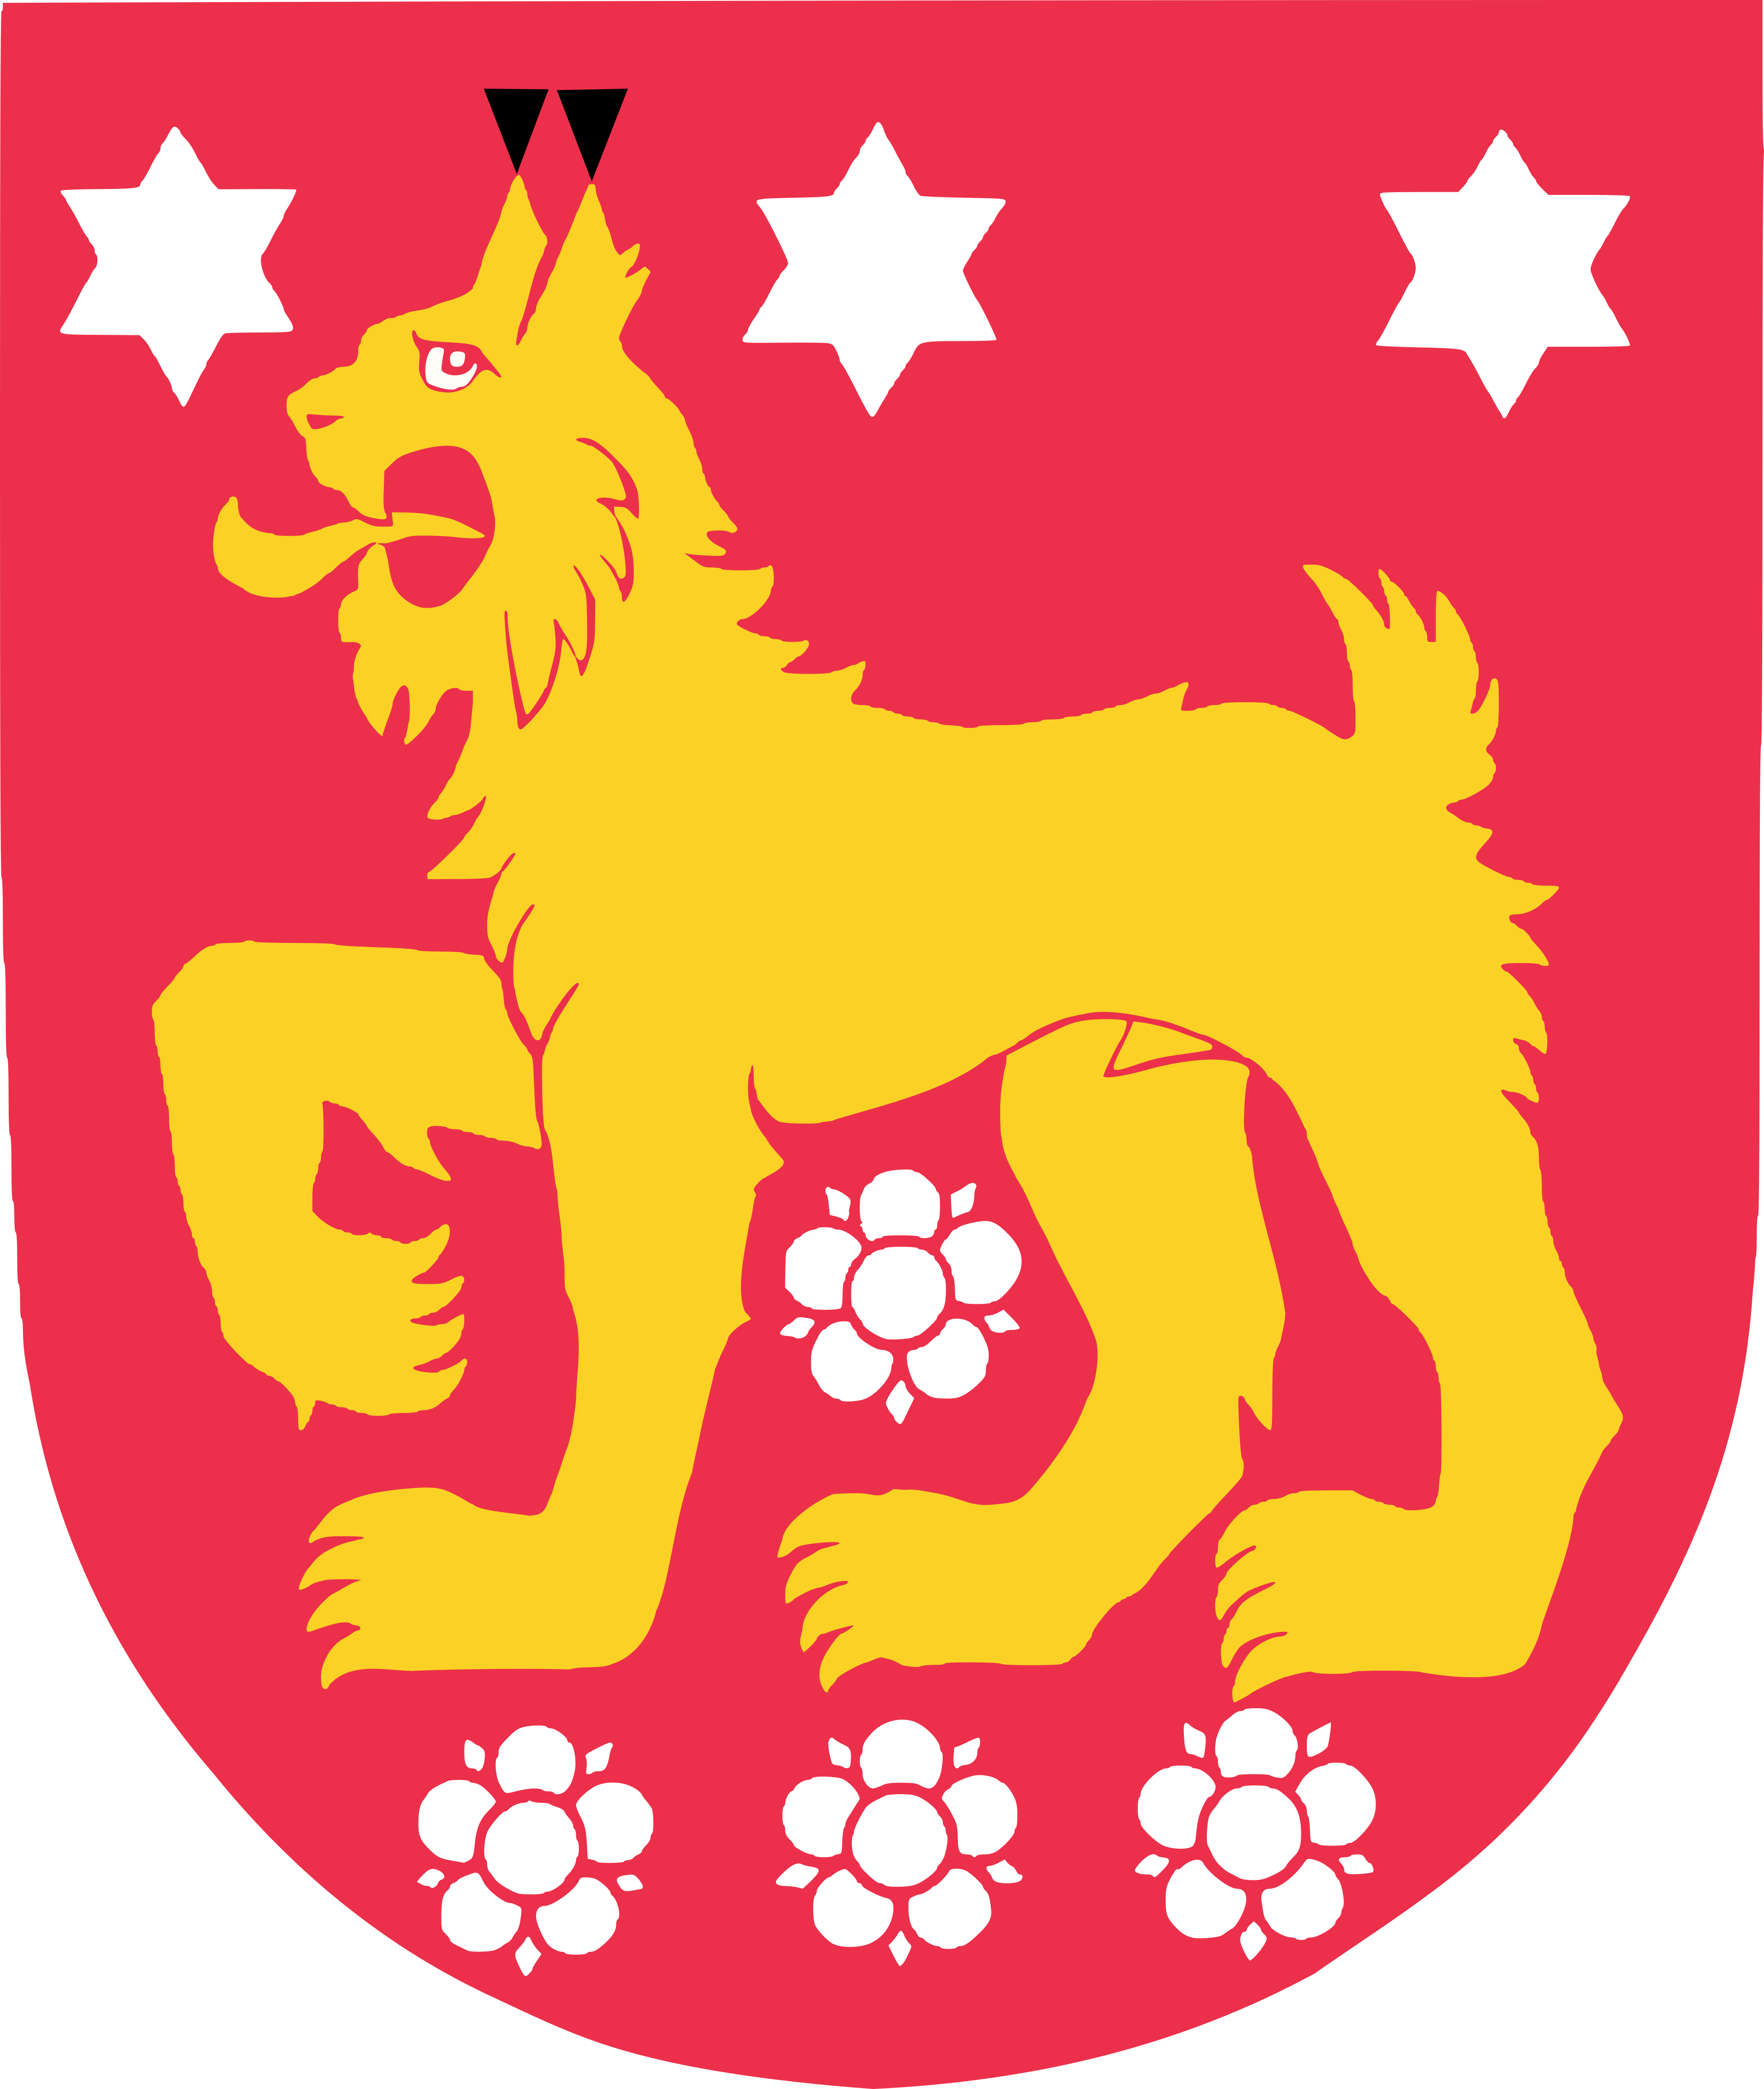 kanta-häme-logo